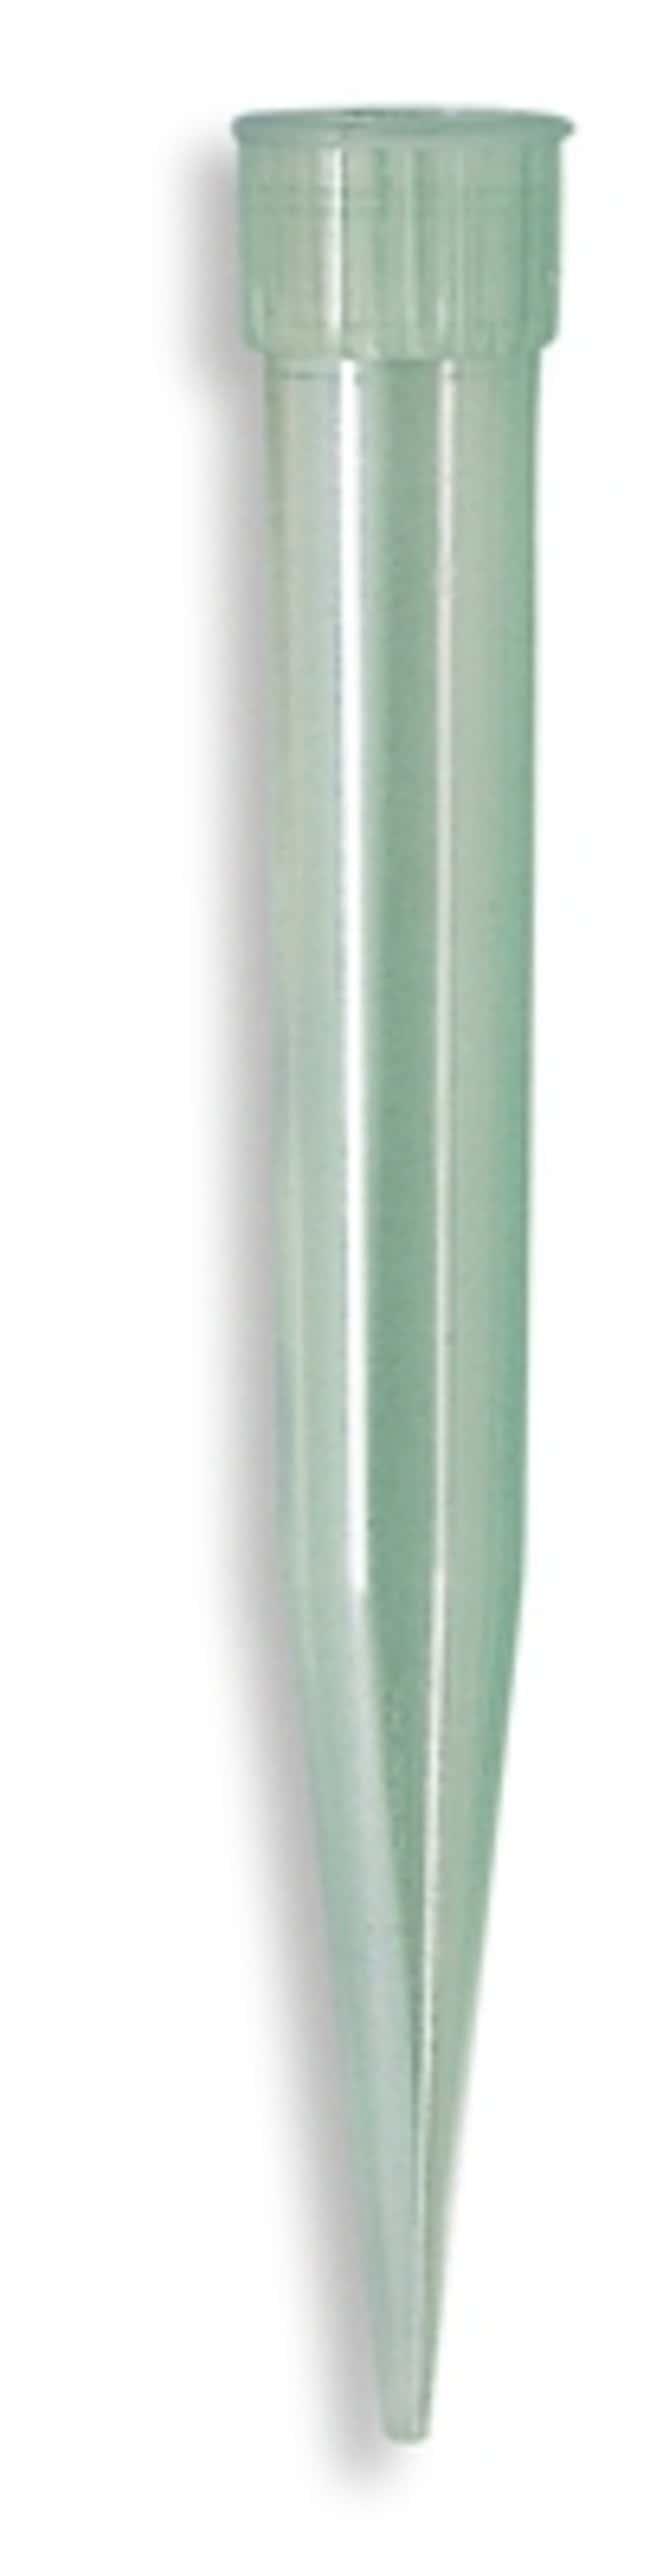 Huber Kaeltmaschinenbau™PTFE Hoses Length: 300cm; Outer Diameter: 44mm Huber Kaeltmaschinenbau™PTFE Hoses